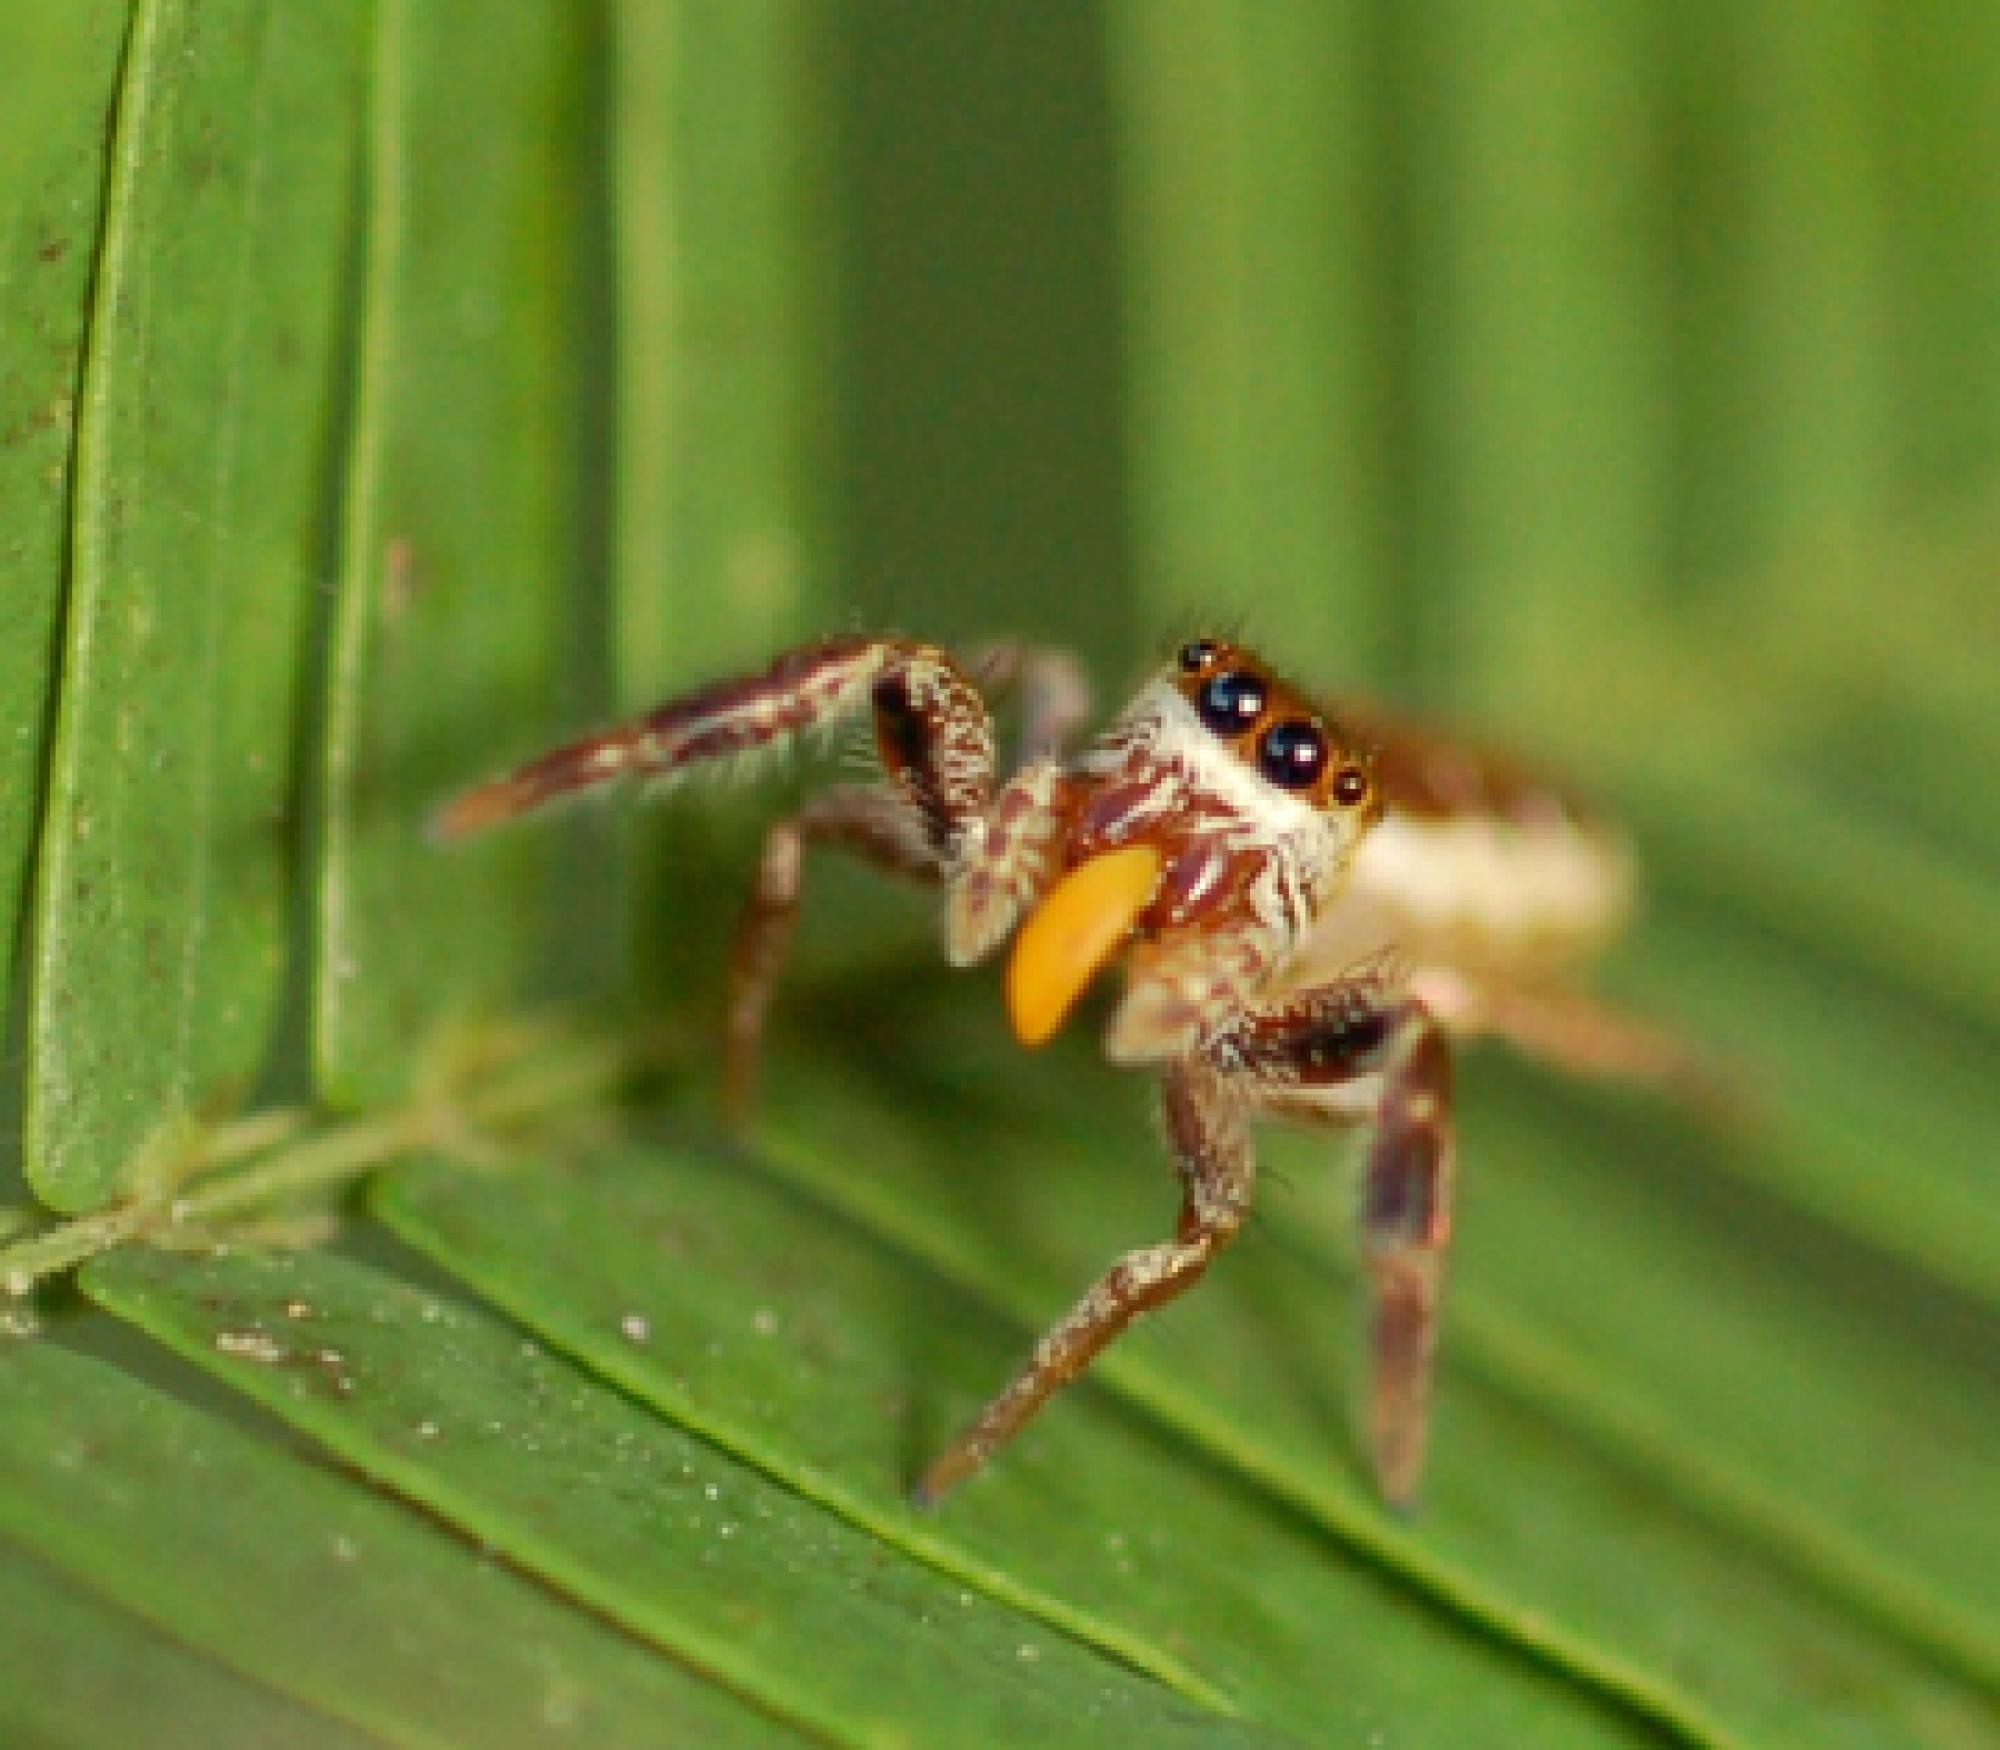 Adult female Bagheera kiplingi eats Beltian body harvested from ant-acacia.